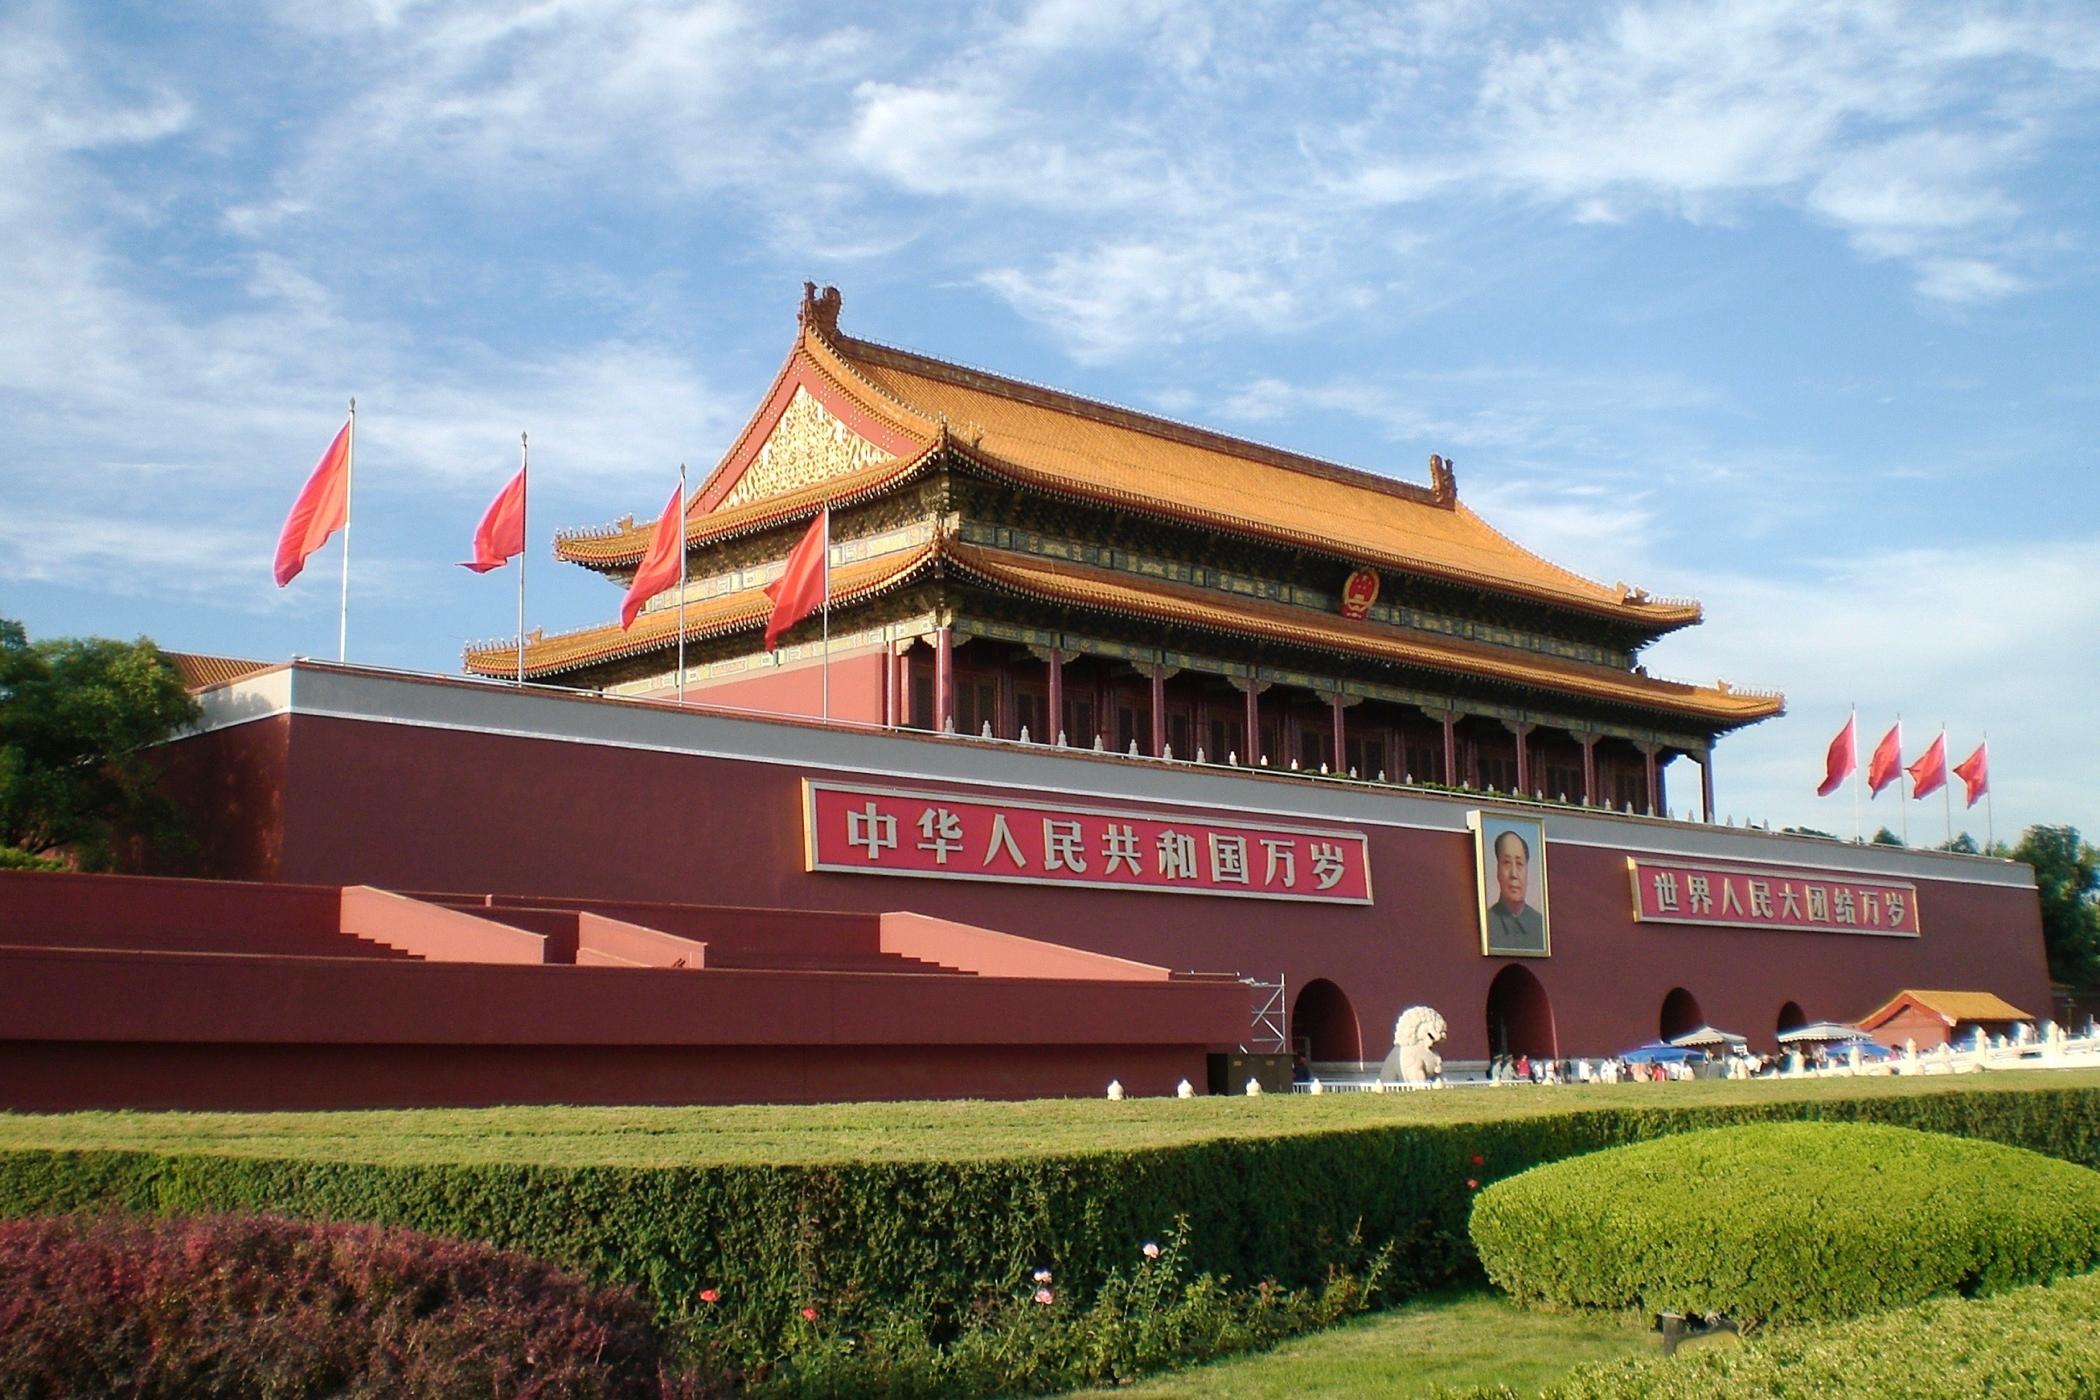 Peking-Sehenswuerdigkeiten-Verbotene-Stadt-Mao